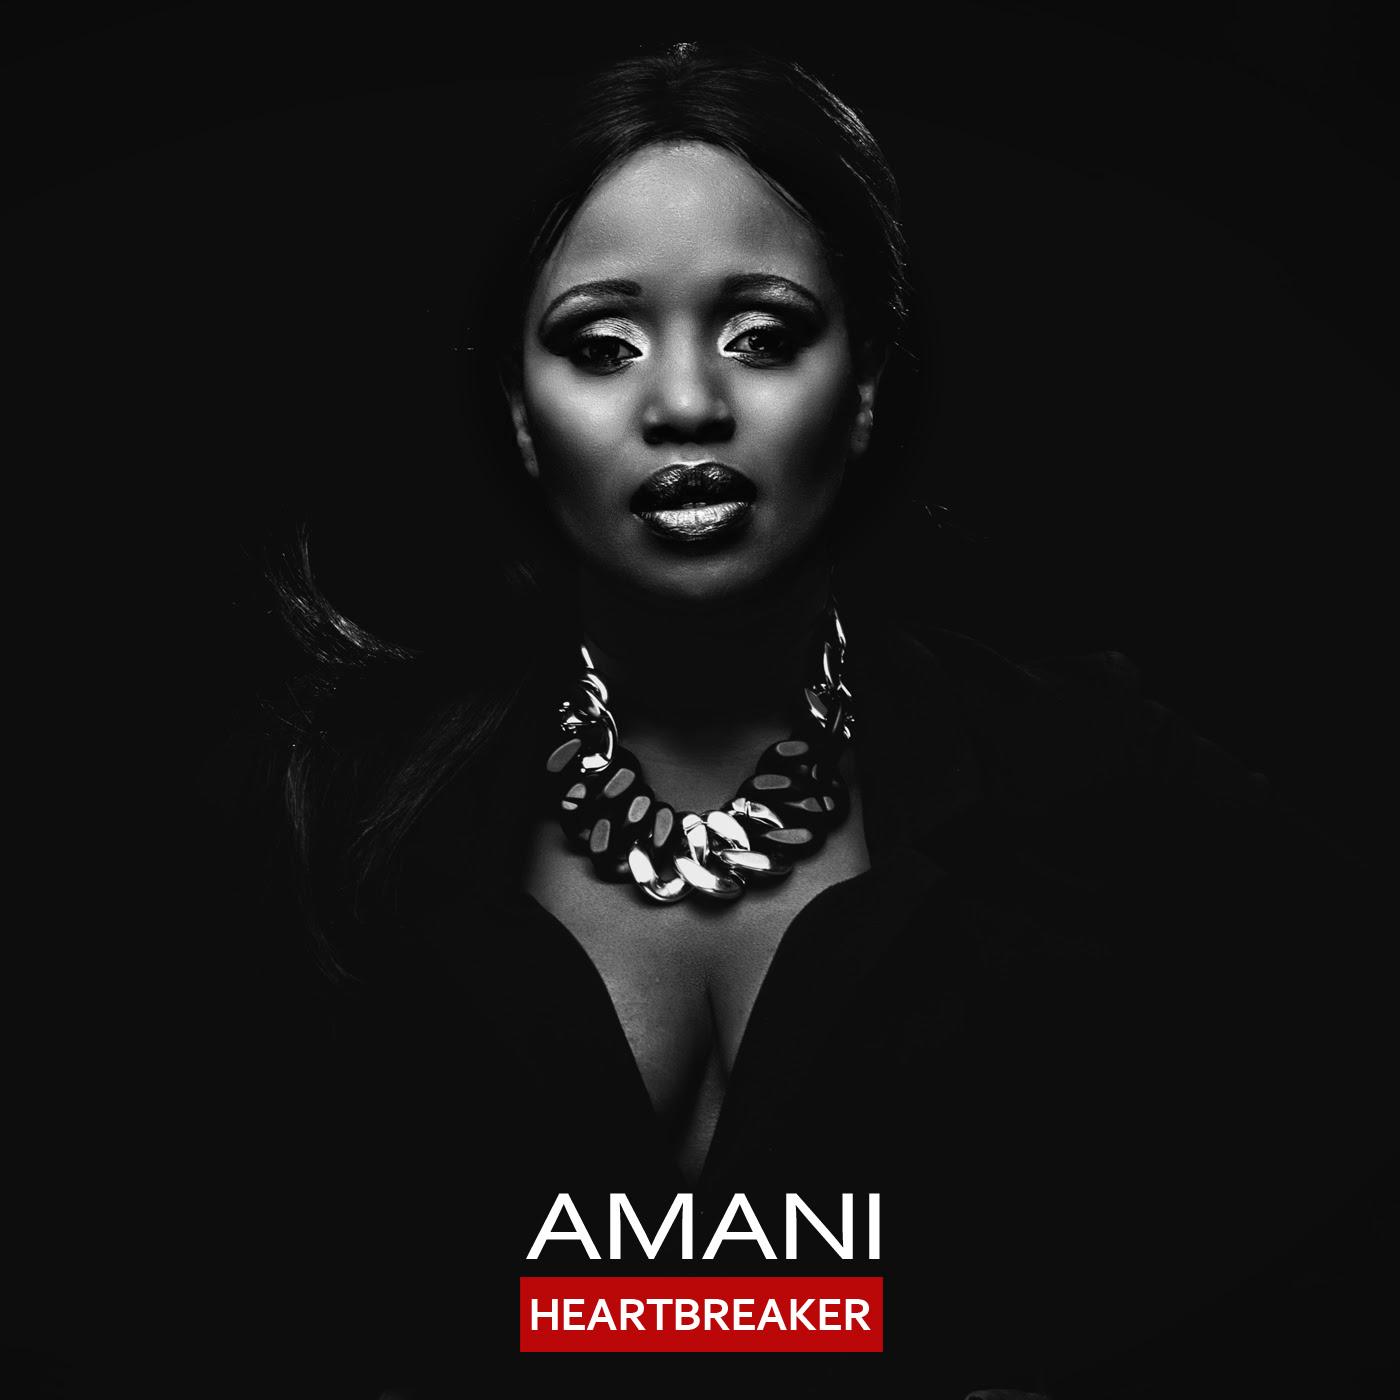 Amani-Heartbreaker_Cl